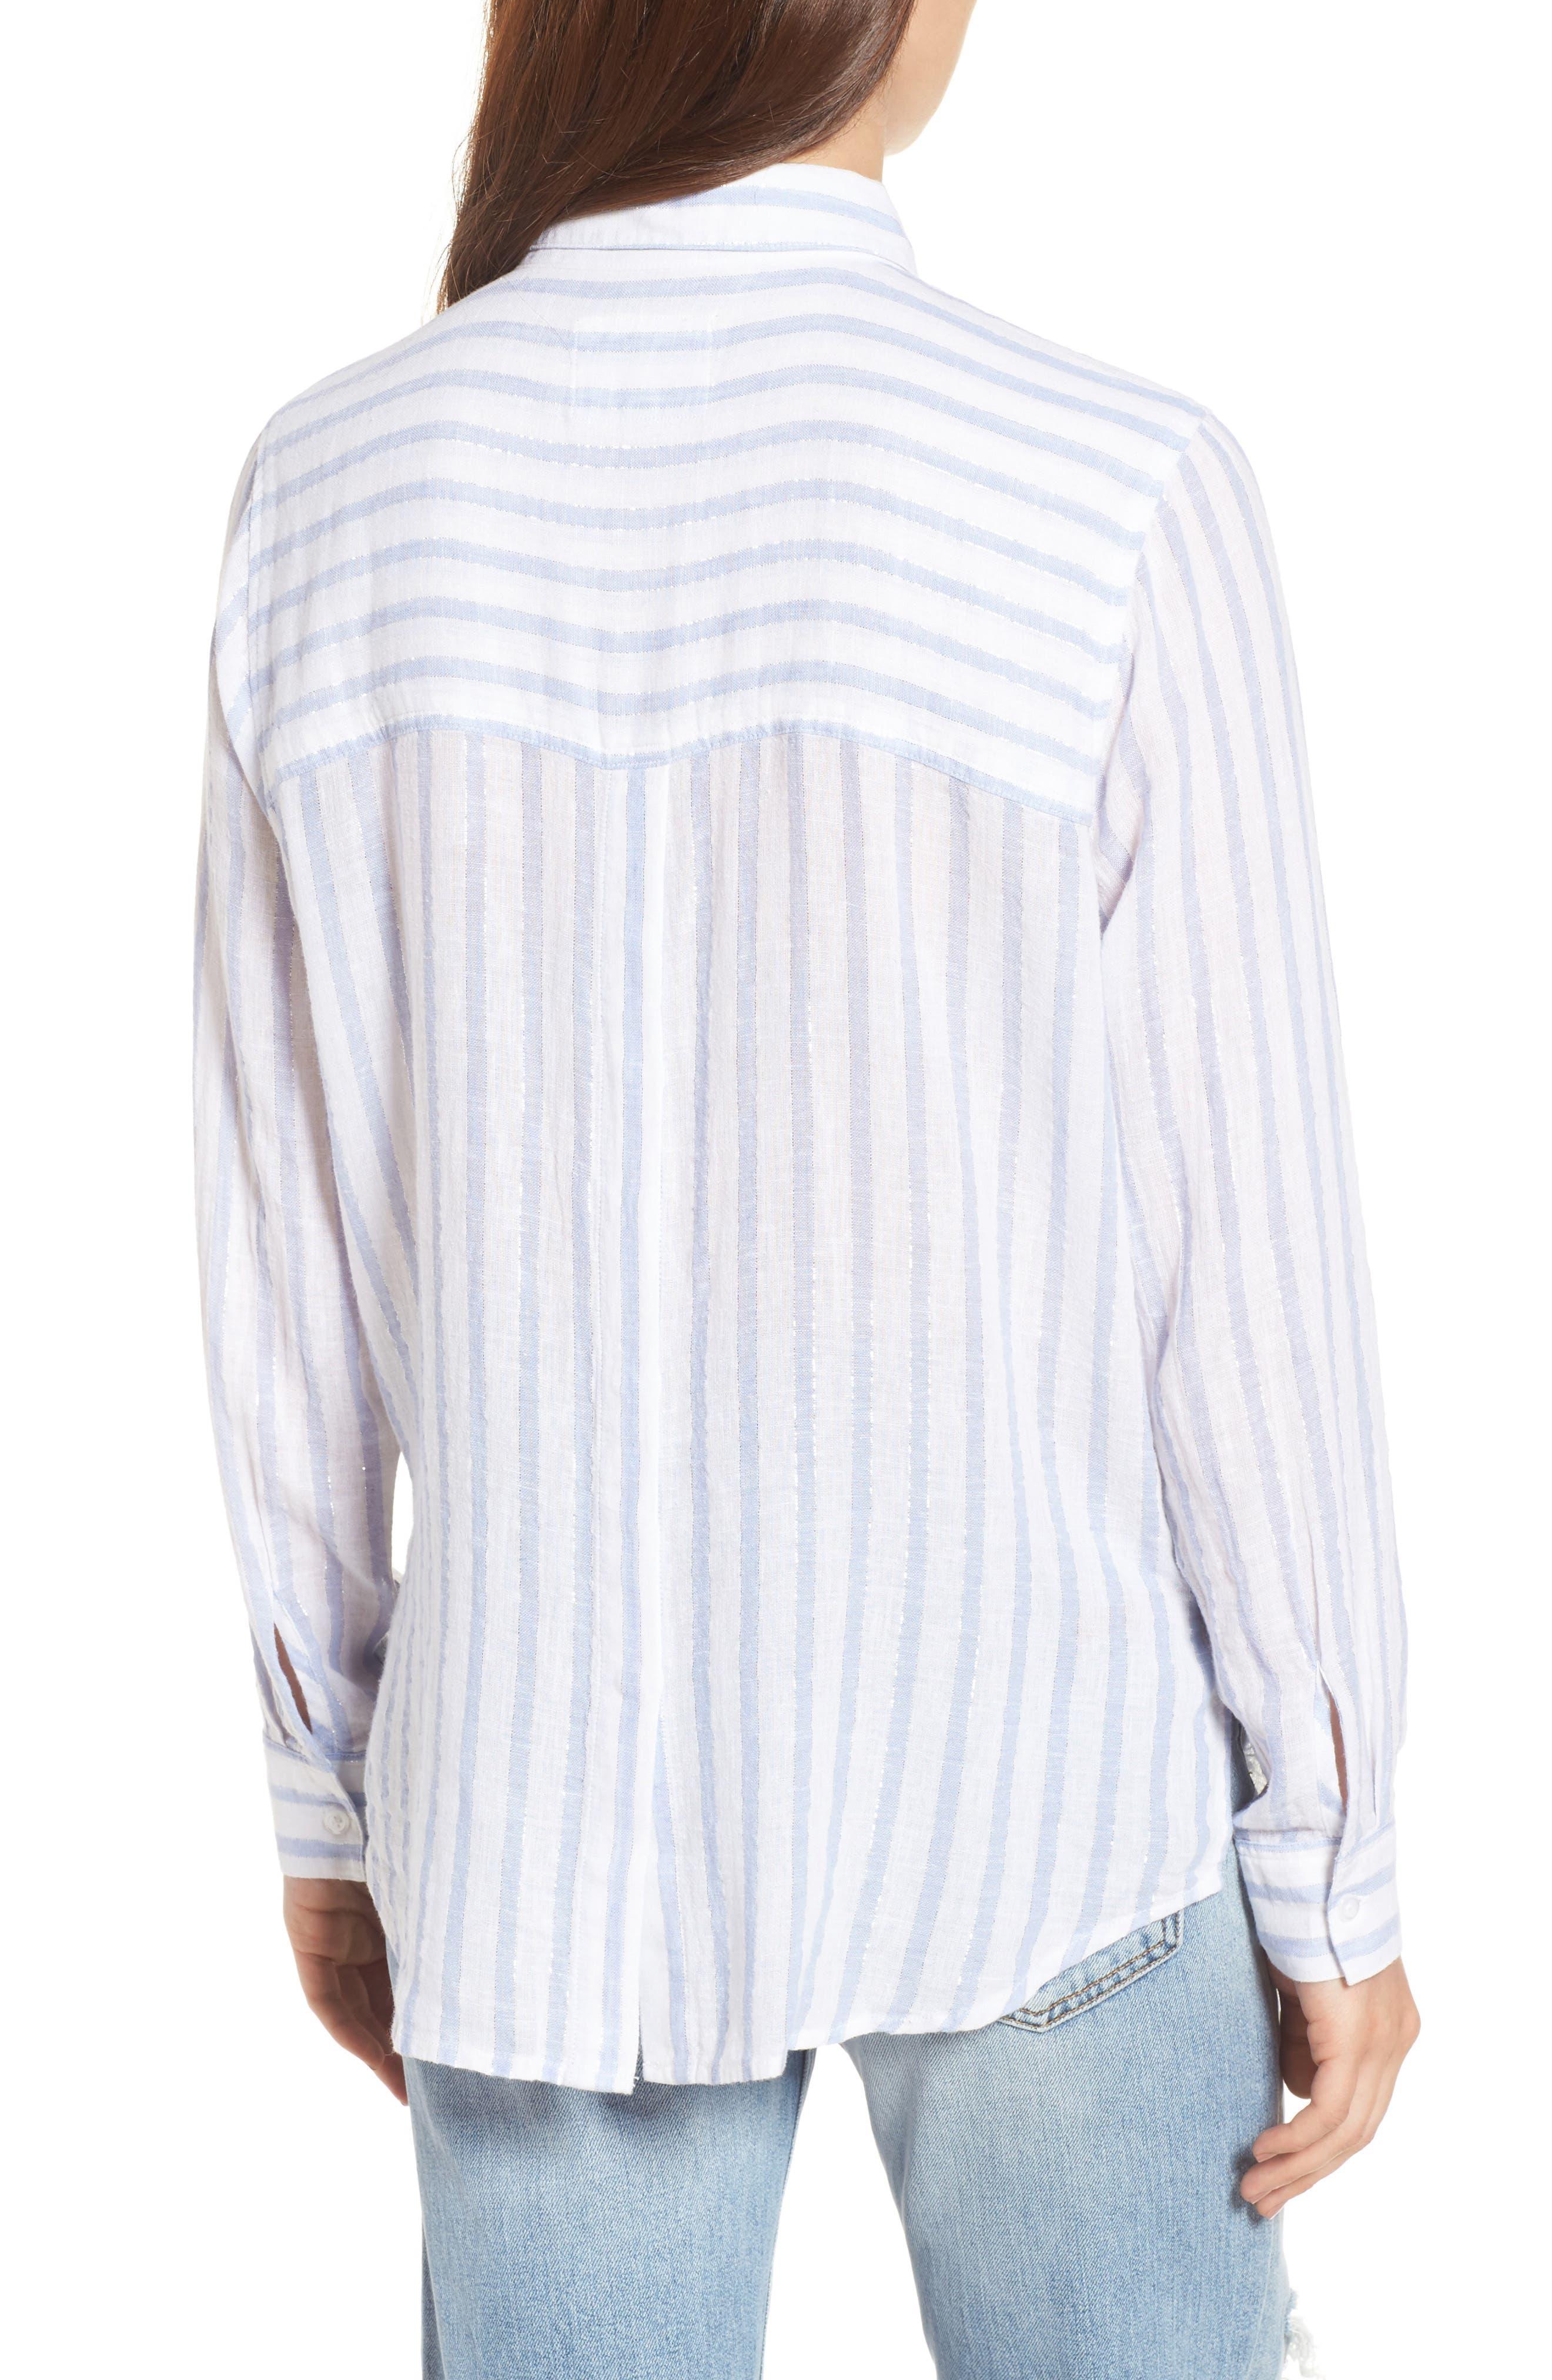 Alternate Image 2  - Rails Sydney Vertical Shimmer Stripe Linen Blend Shirt